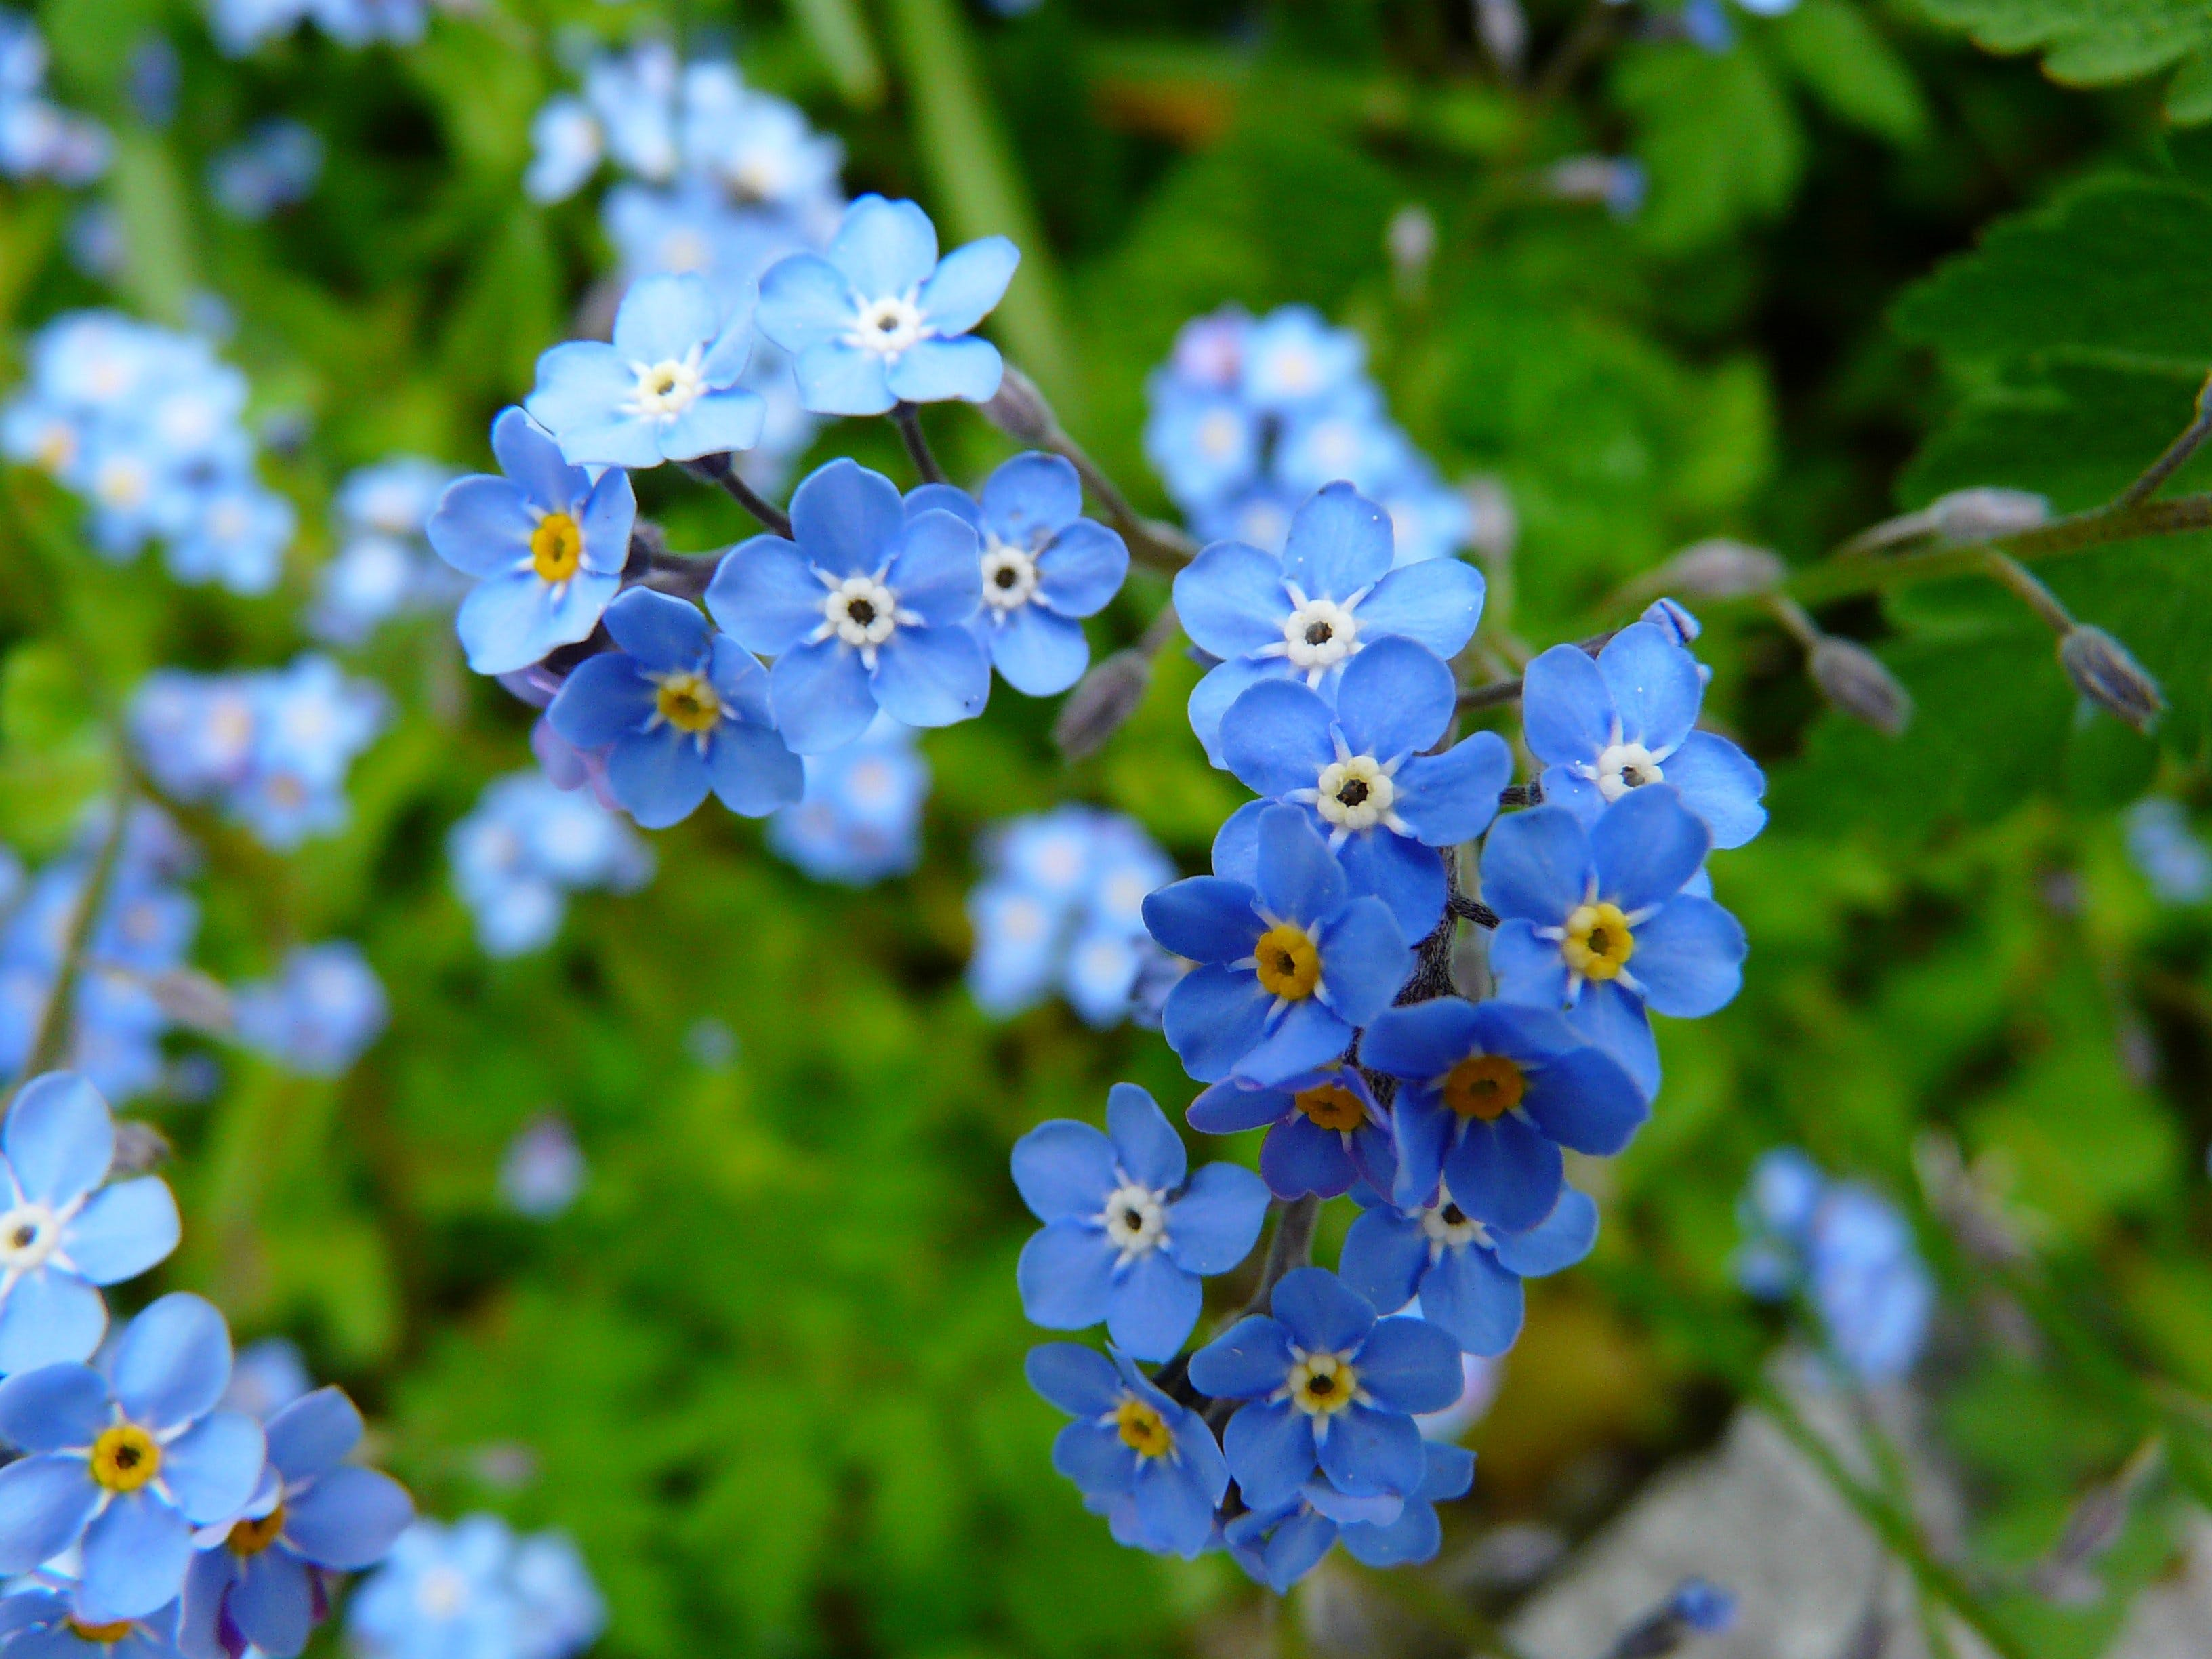 Blue 5 Petaled Flowers